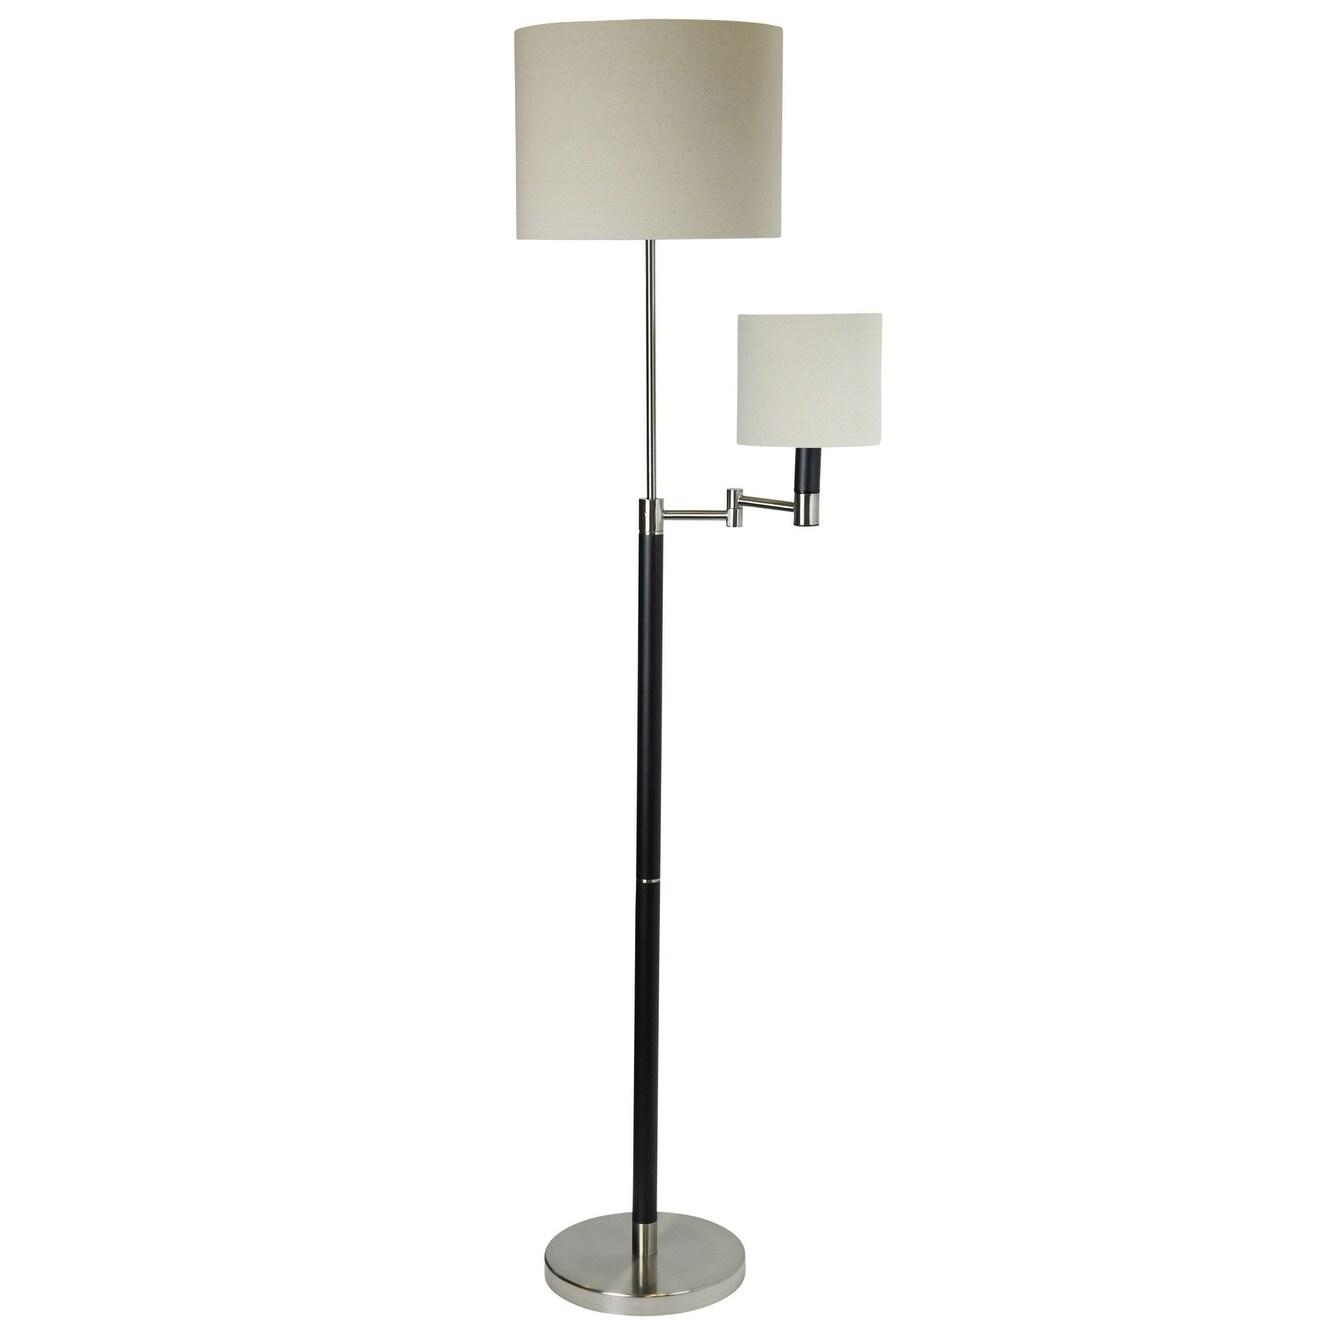 Tall Tree Style Floor Lamp